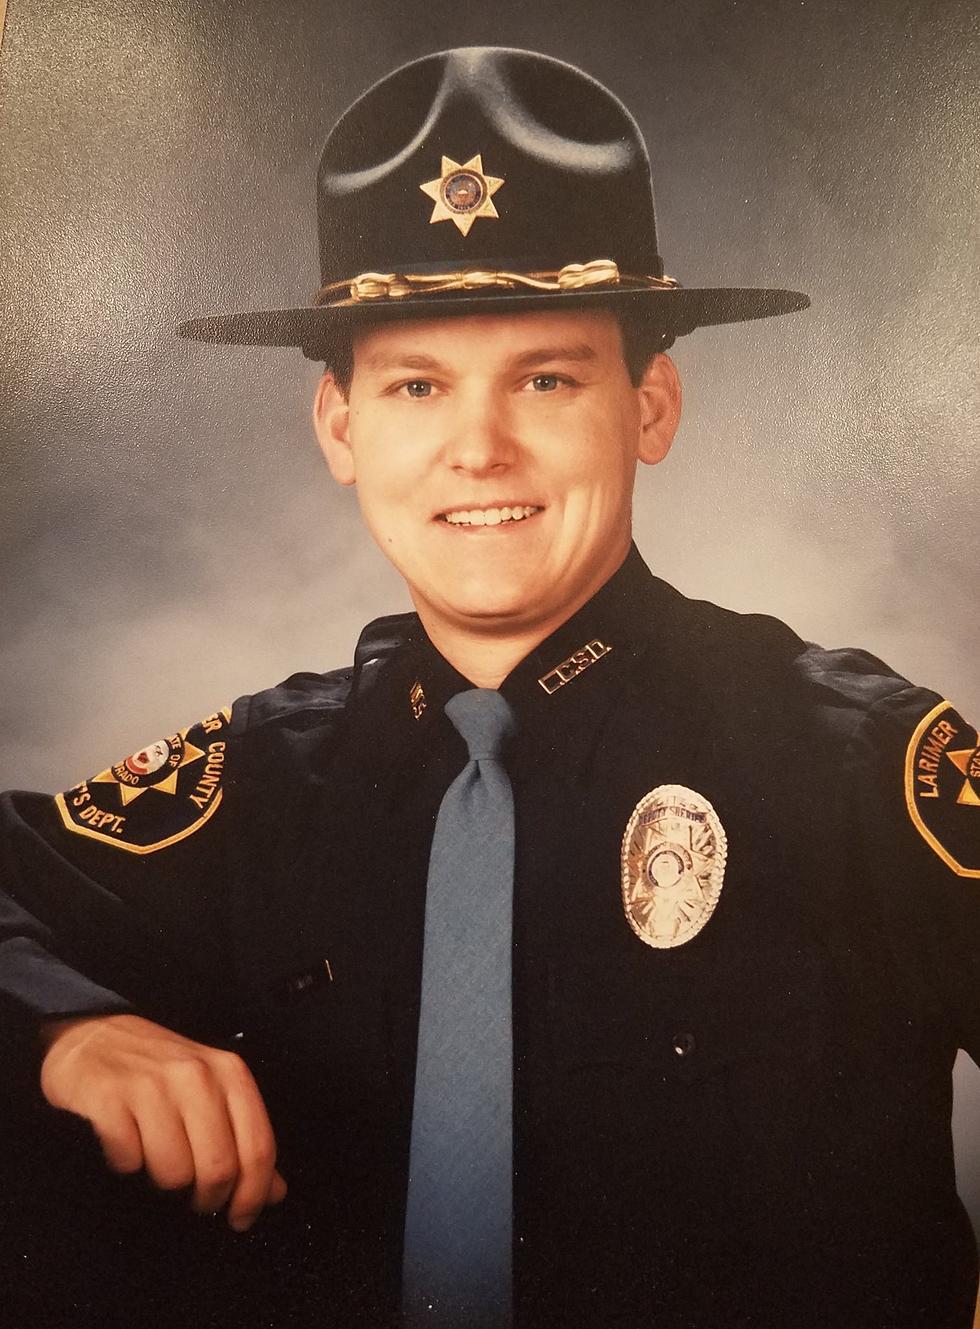 Sheriff Justin Smith Celebrates 25 Years with Larimer County